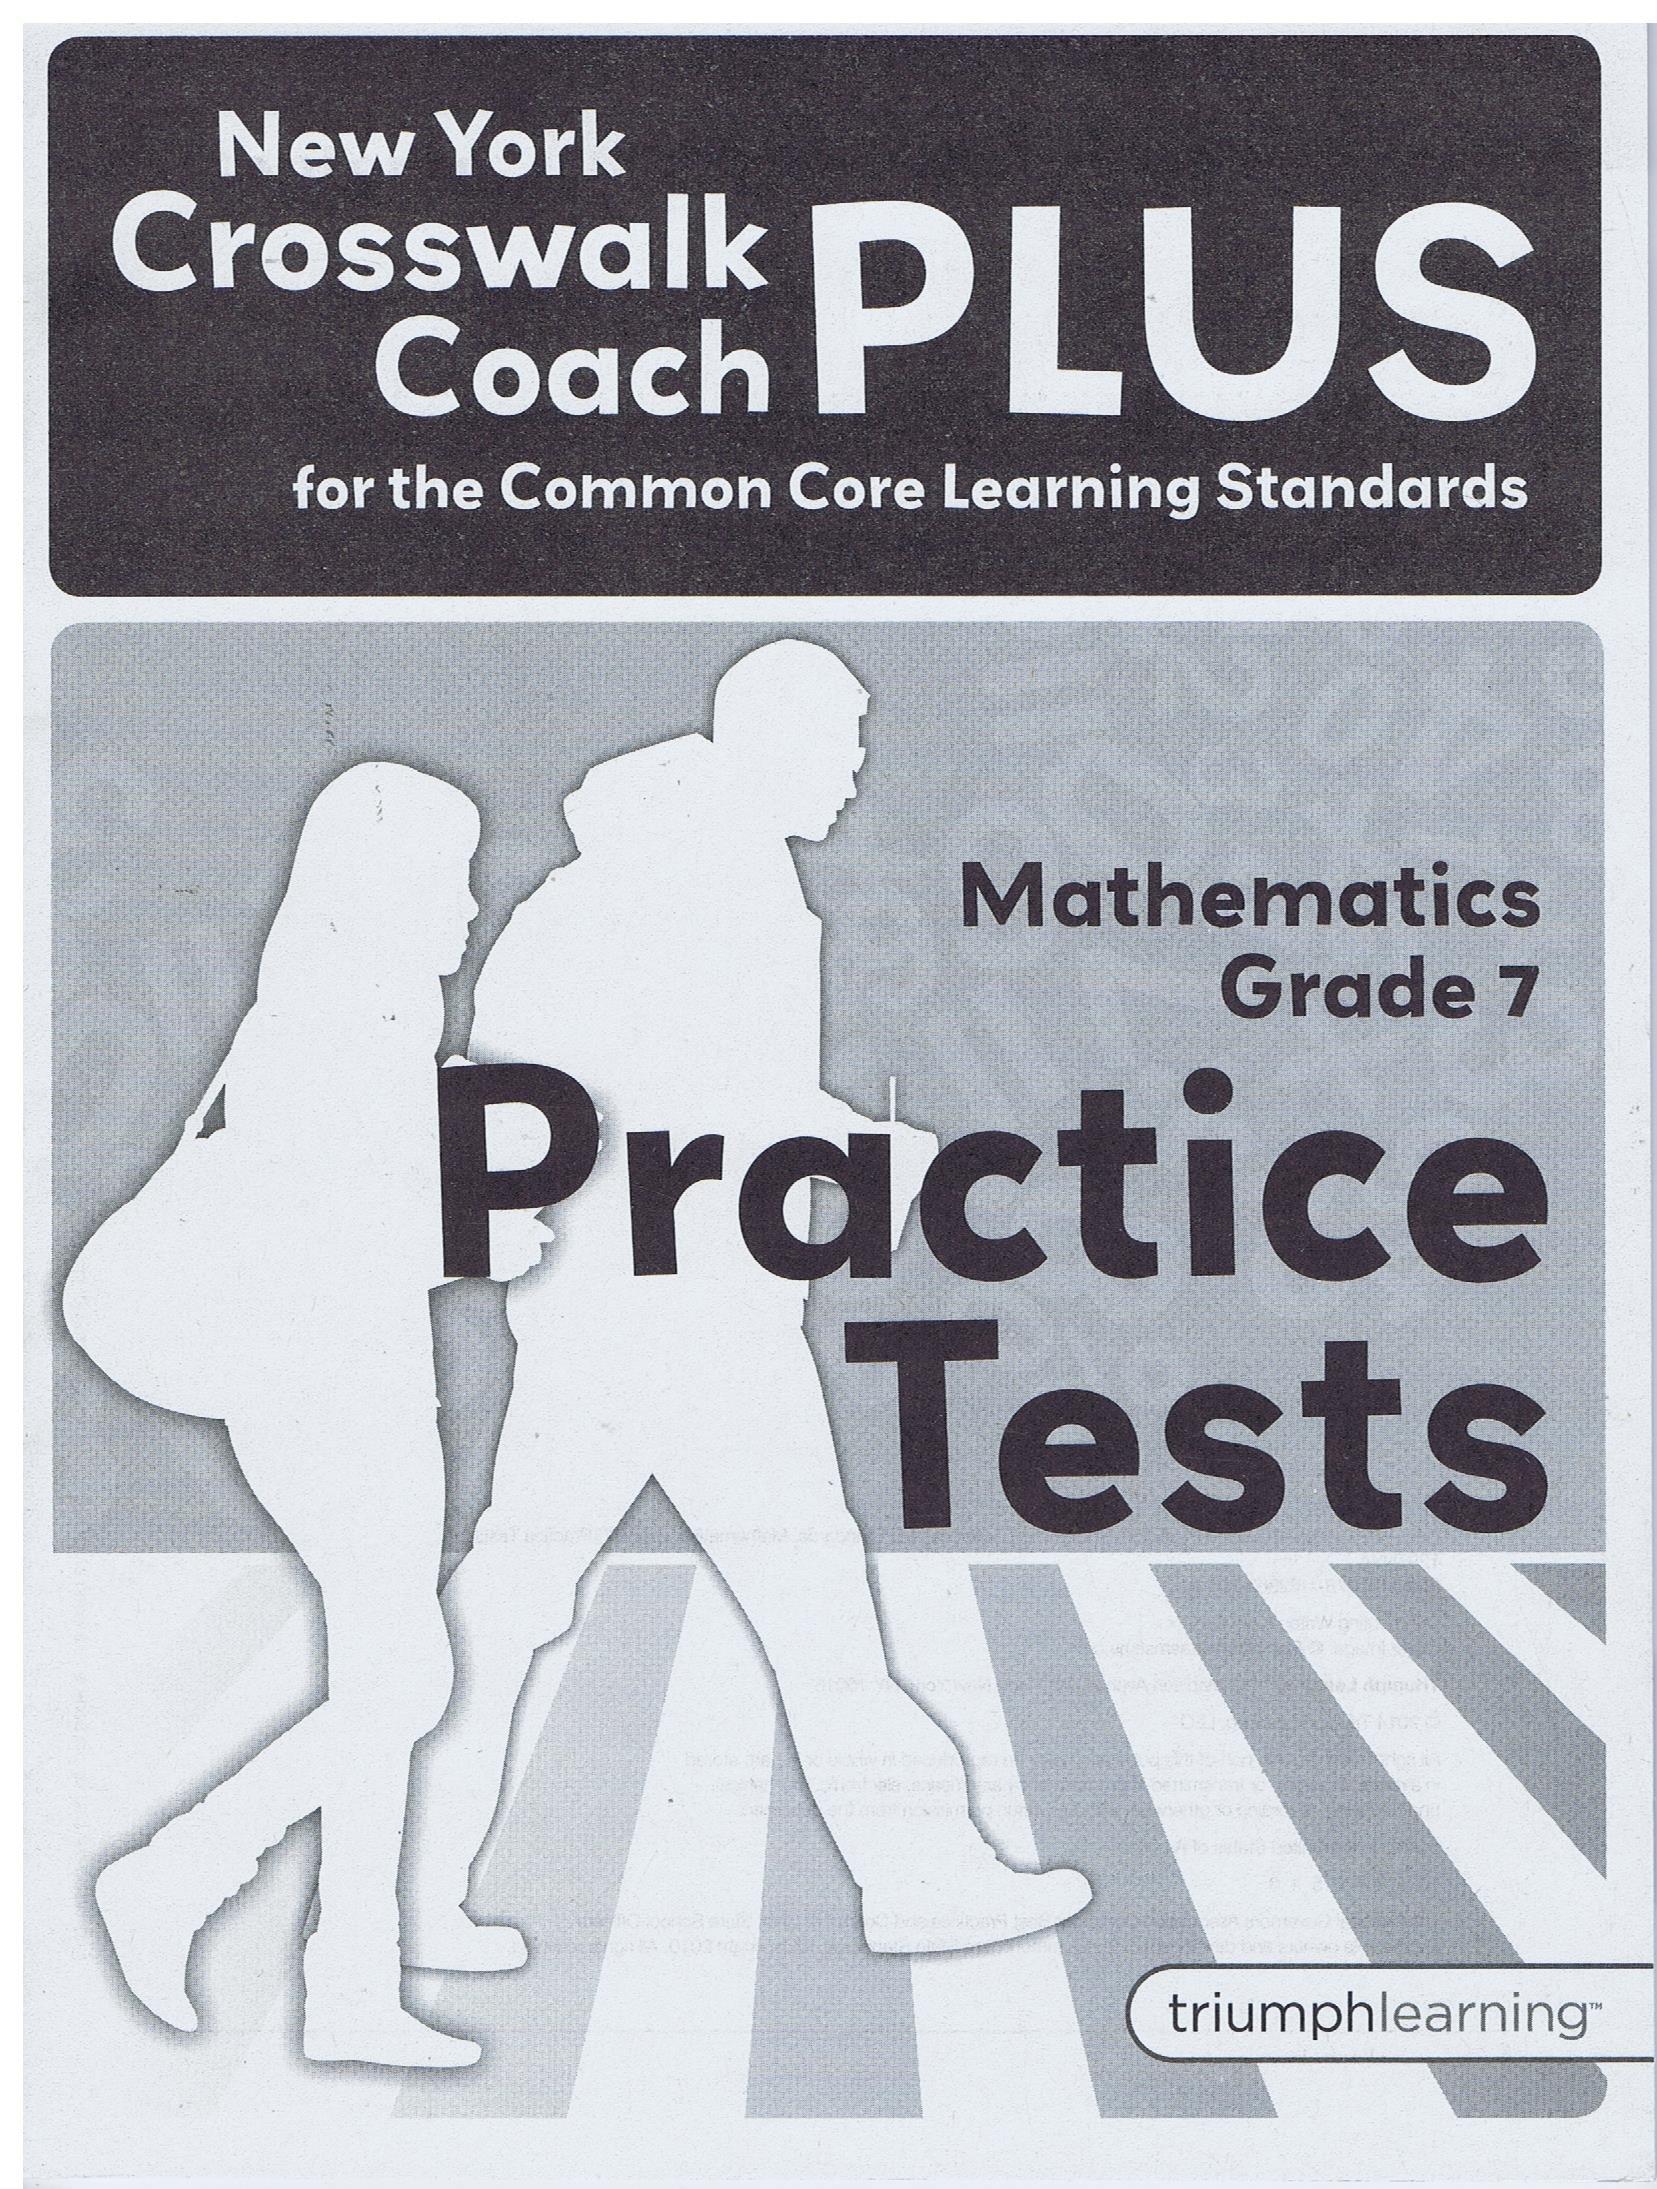 New York Crosswalk Coach Plus Practice tests grade 7 Math PDF ePub fb2 book